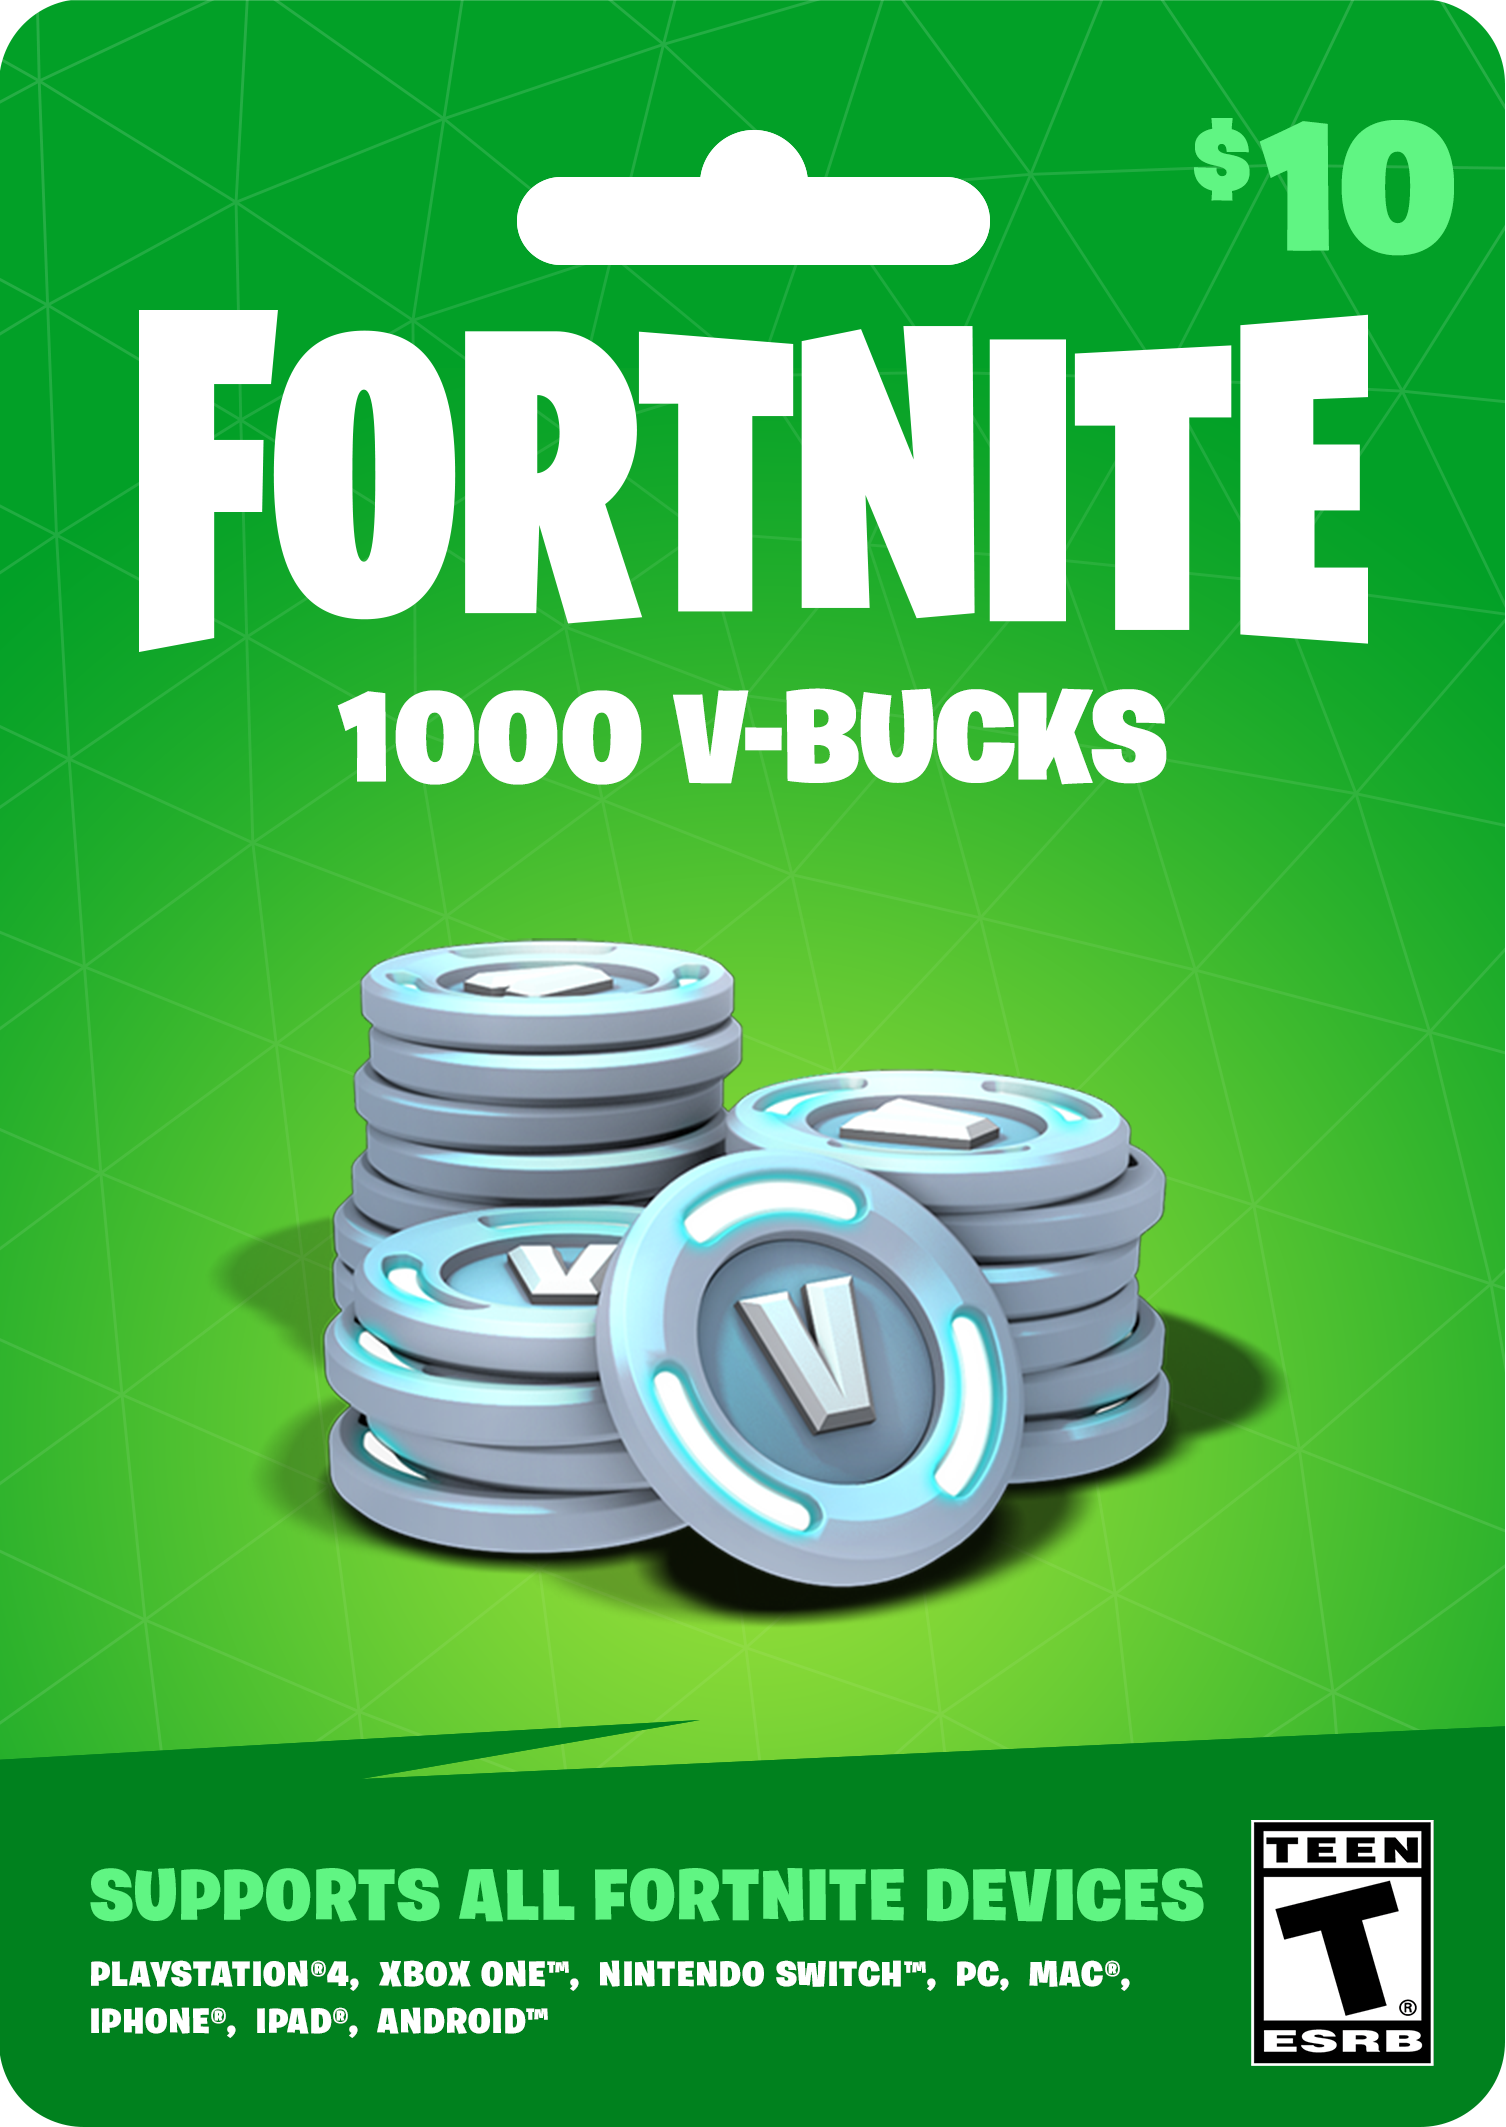 Fortnite 10 VBucks Currency card, Cool things to buy